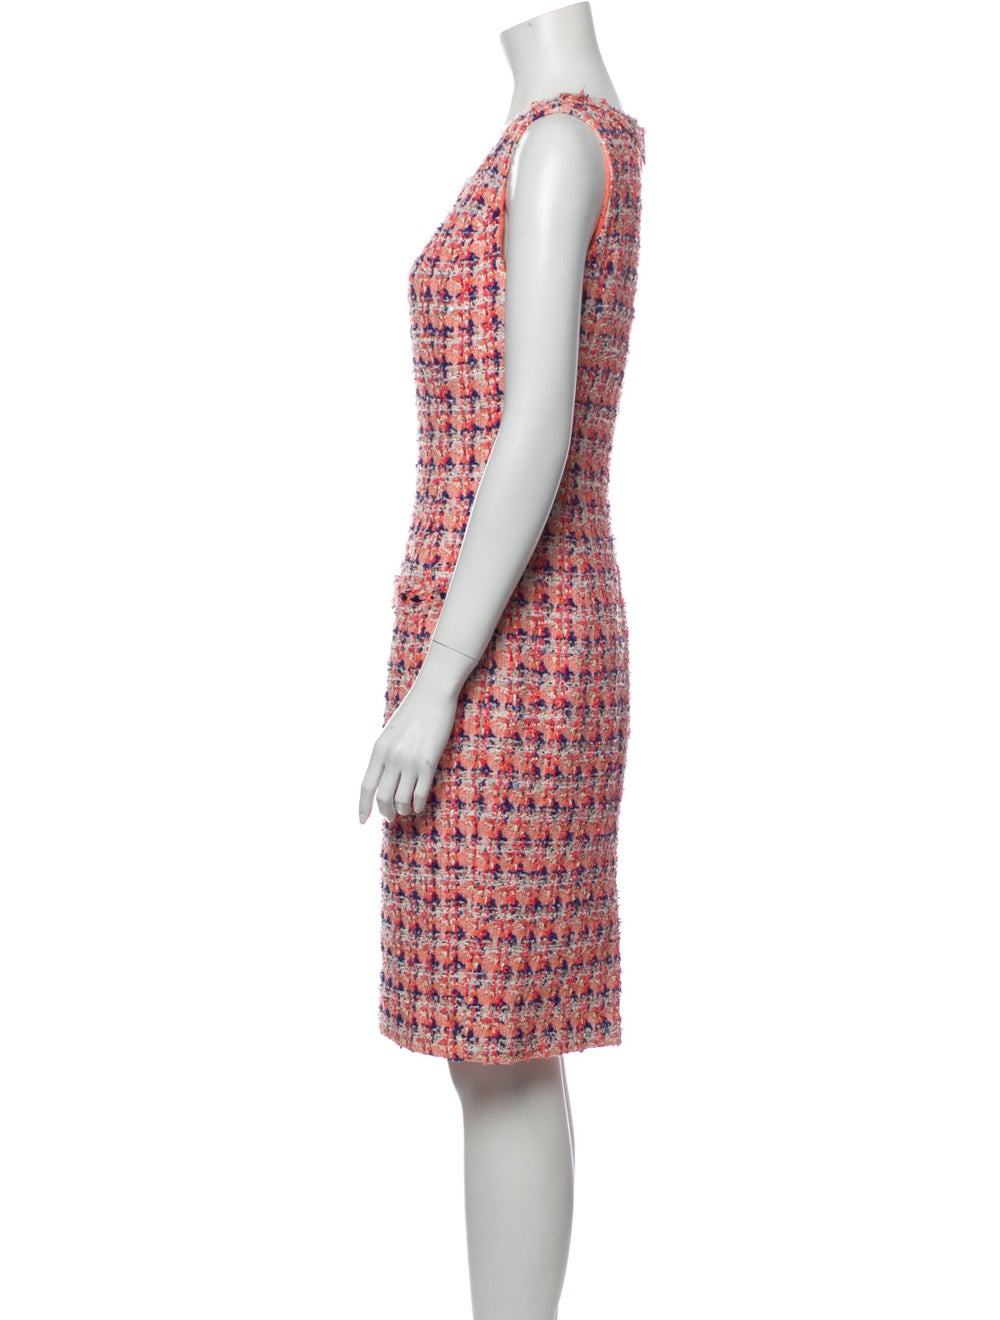 Oscar de la Renta Printed Knee-Length Dress Pink - image 2